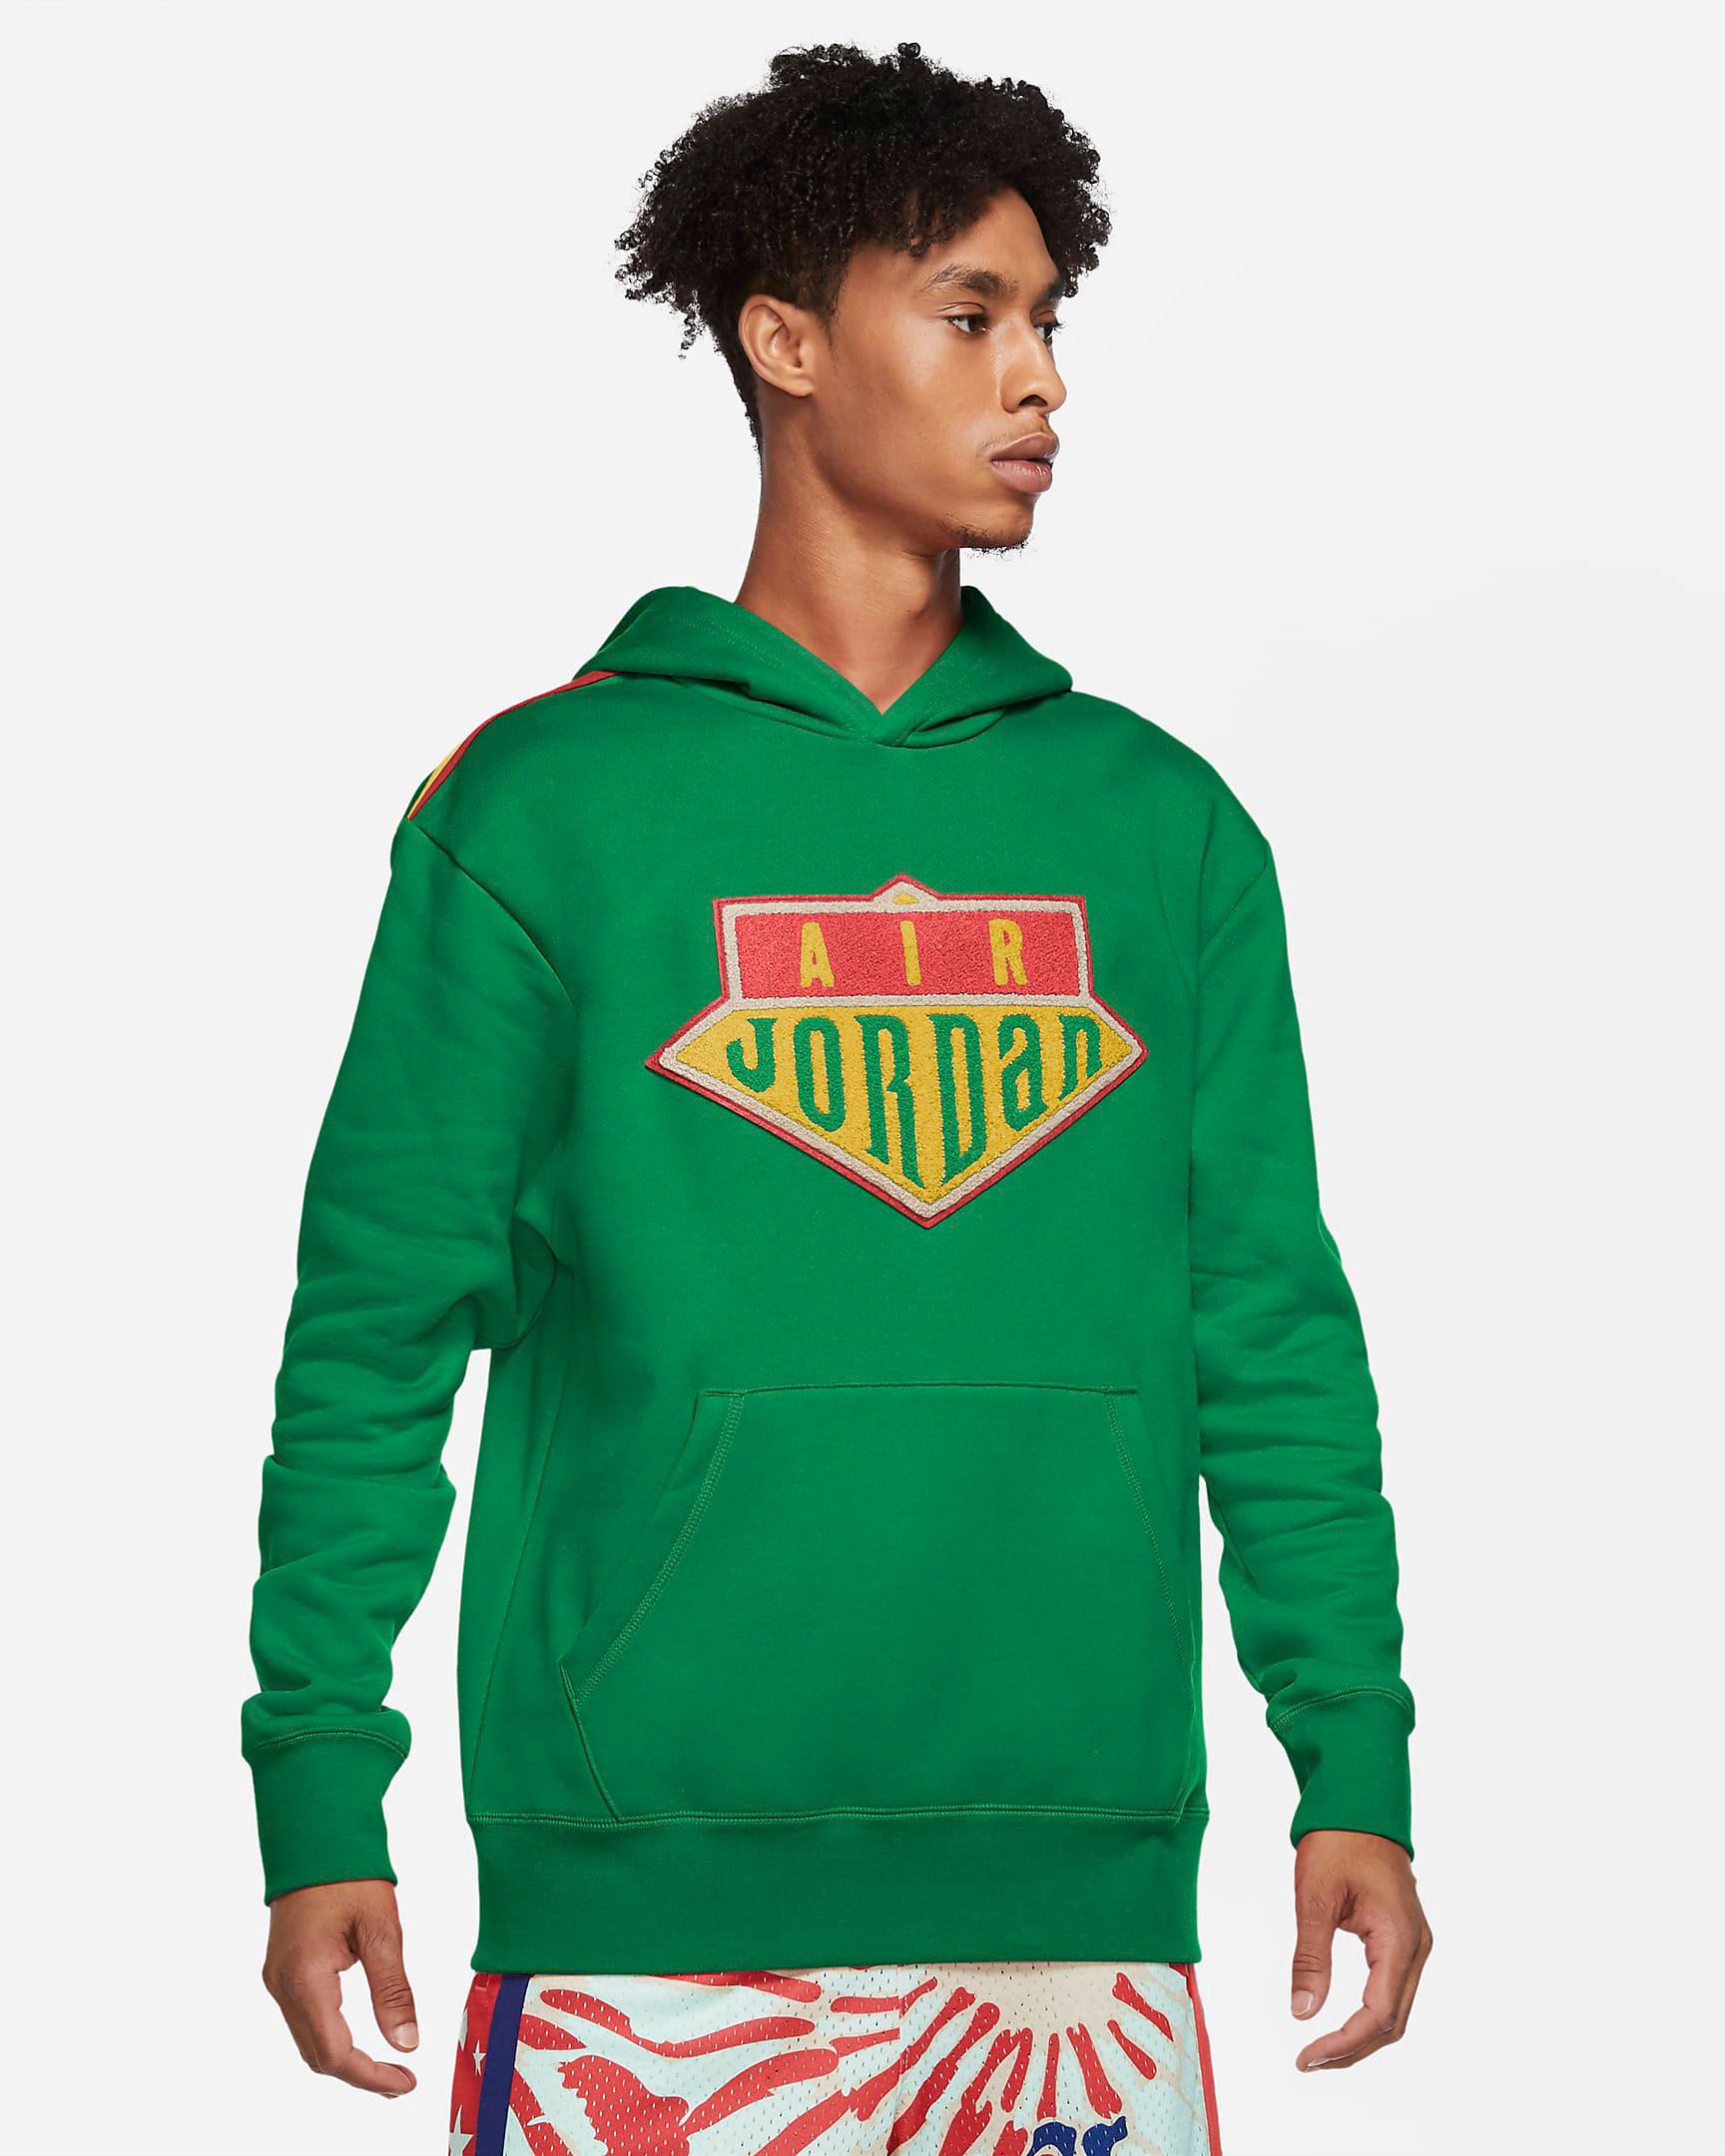 jordan-sport-dna-hoodie-green-gold-red-1